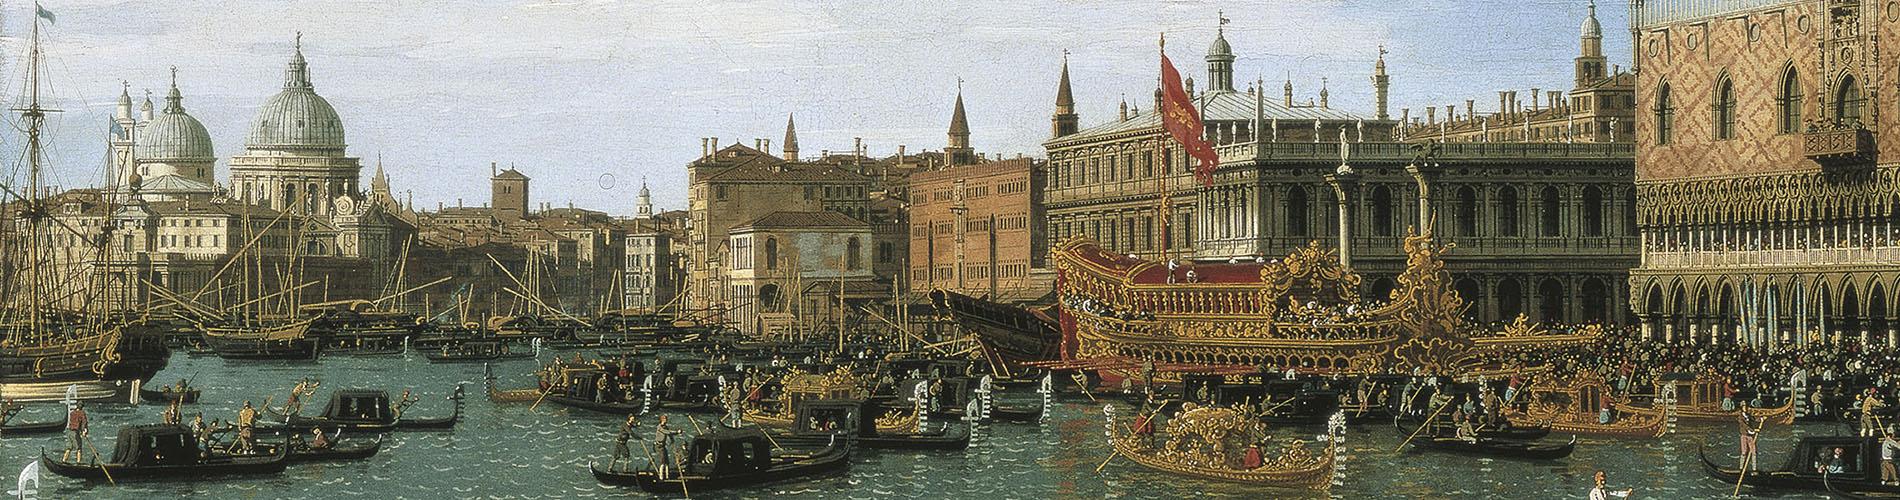 Retorn «d'Il Bucintoro» el dia de l'Ascensió, Giovanni Antonio Canal (Canaletto), 1745-1750